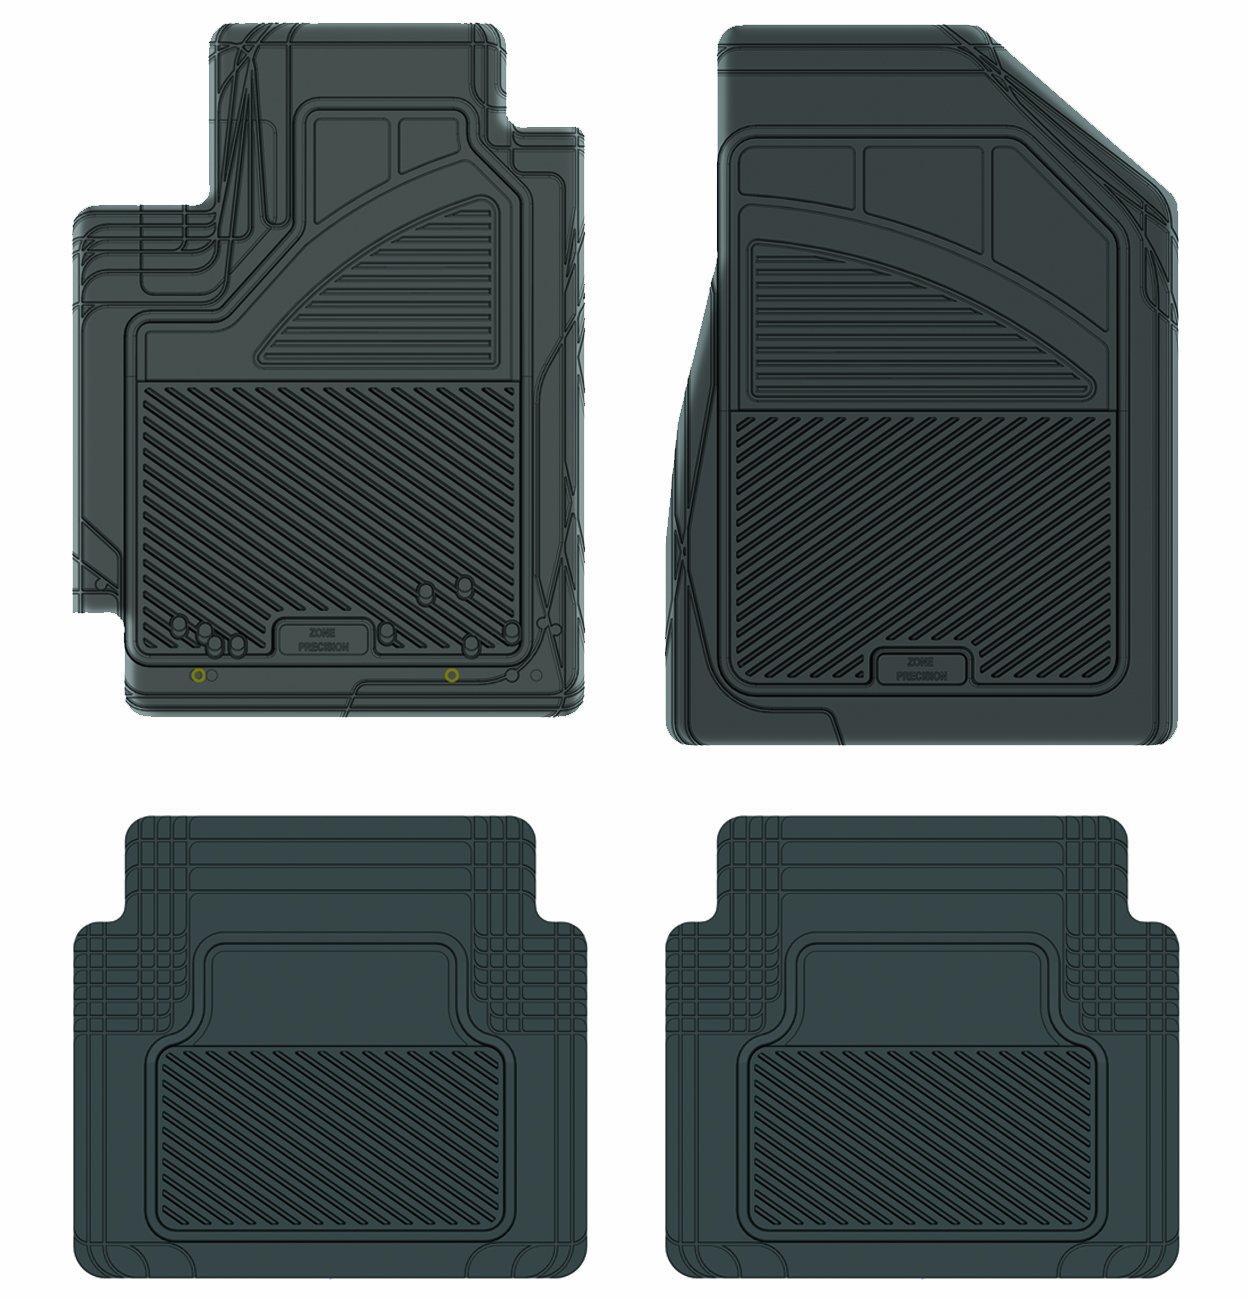 Koolatron Pants Saver Custom Fit 4 Piece All Weather Car Mat for Select Toyota Camry Models Grey